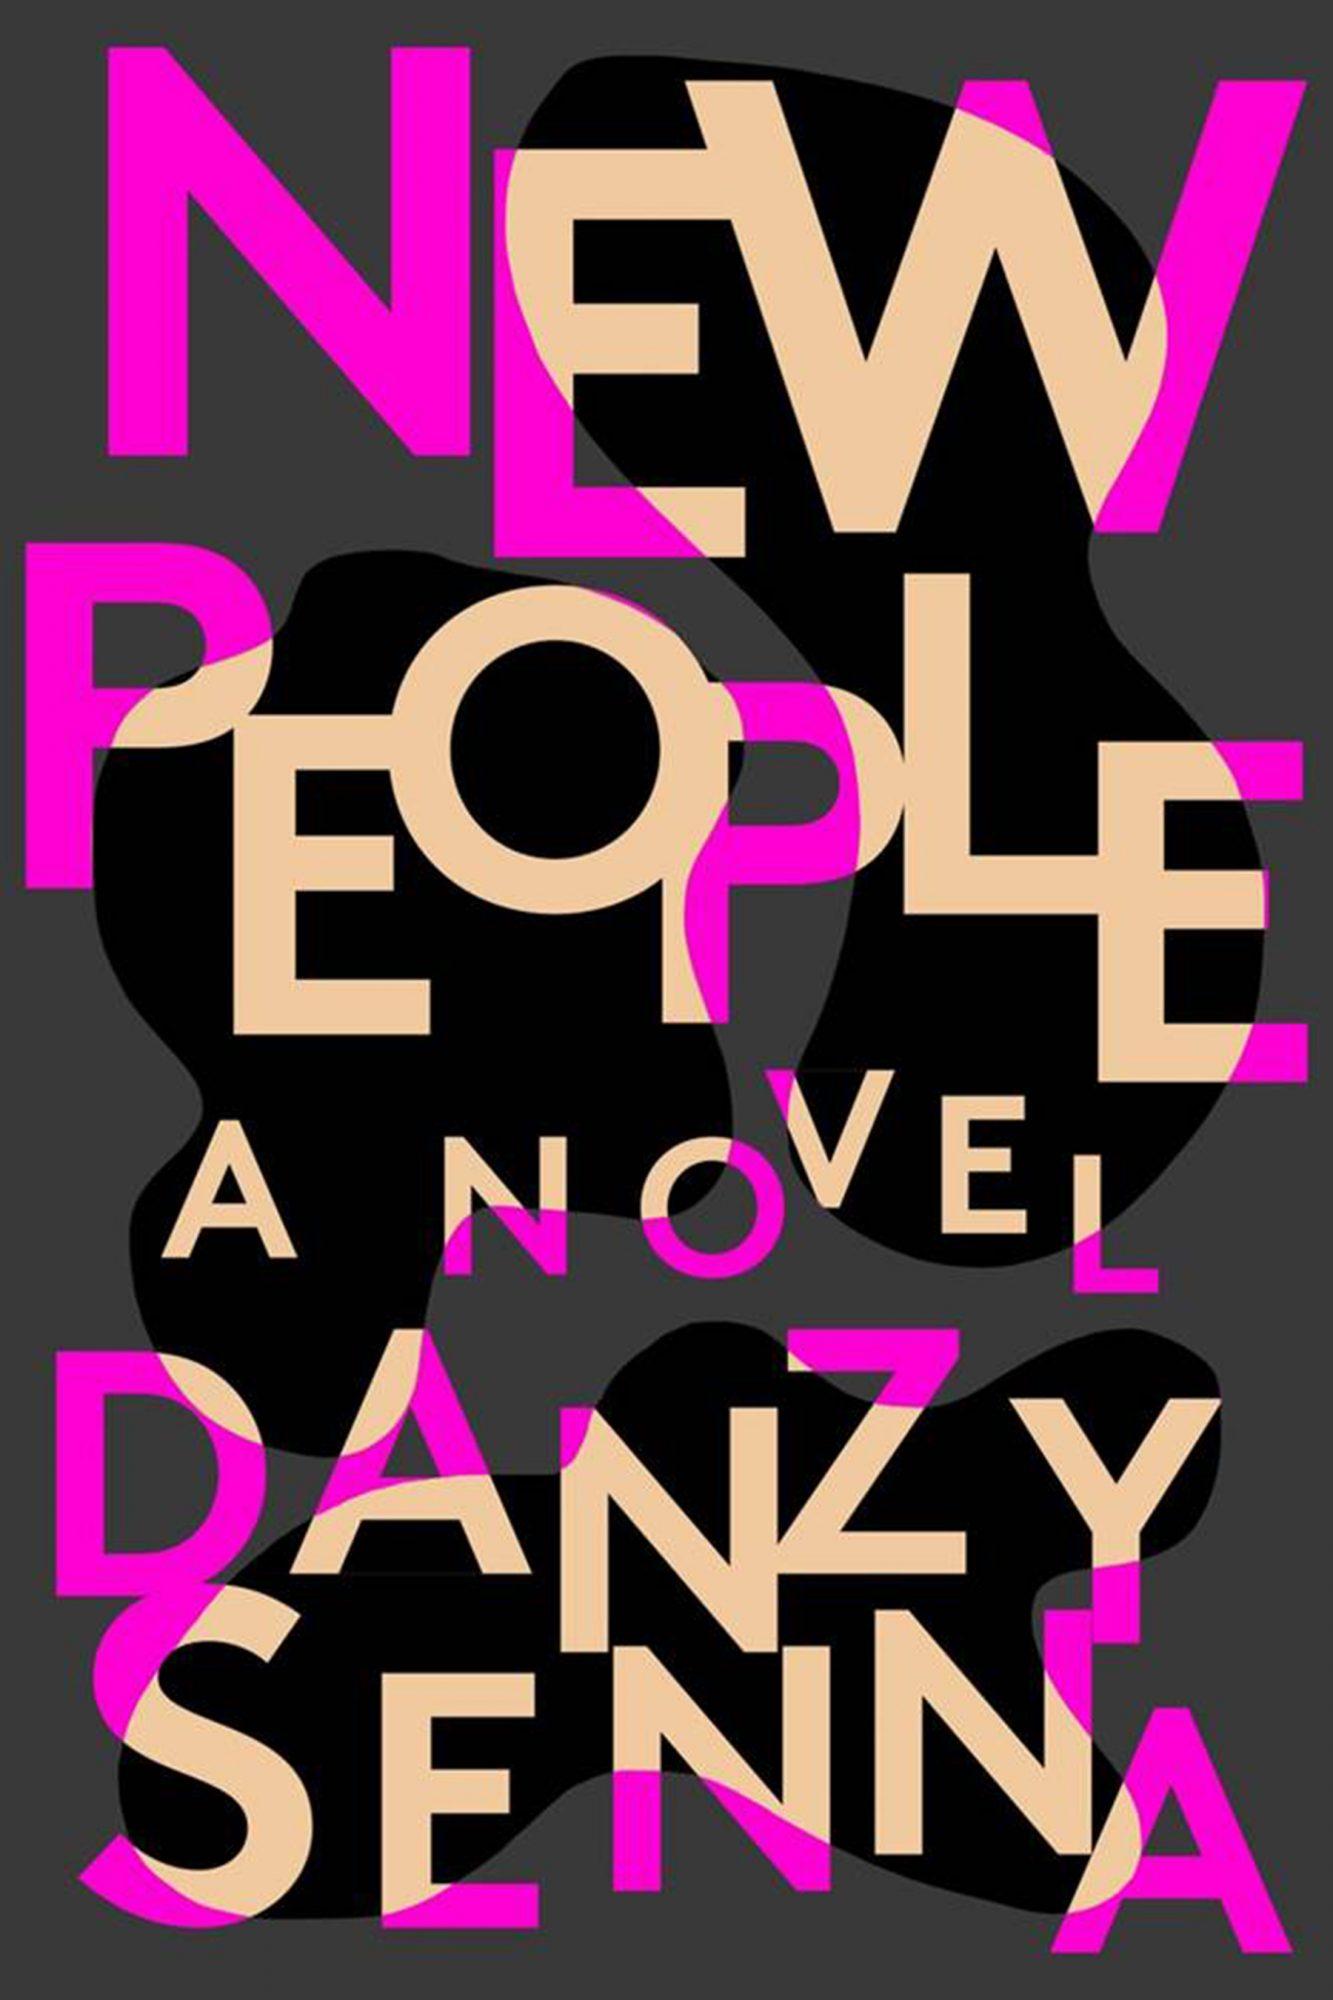 new_people_-_danzy_senna_high_res_318714c1fbf7e89fb7f9f79eca250e23.nbcnews-ux-2880-1000